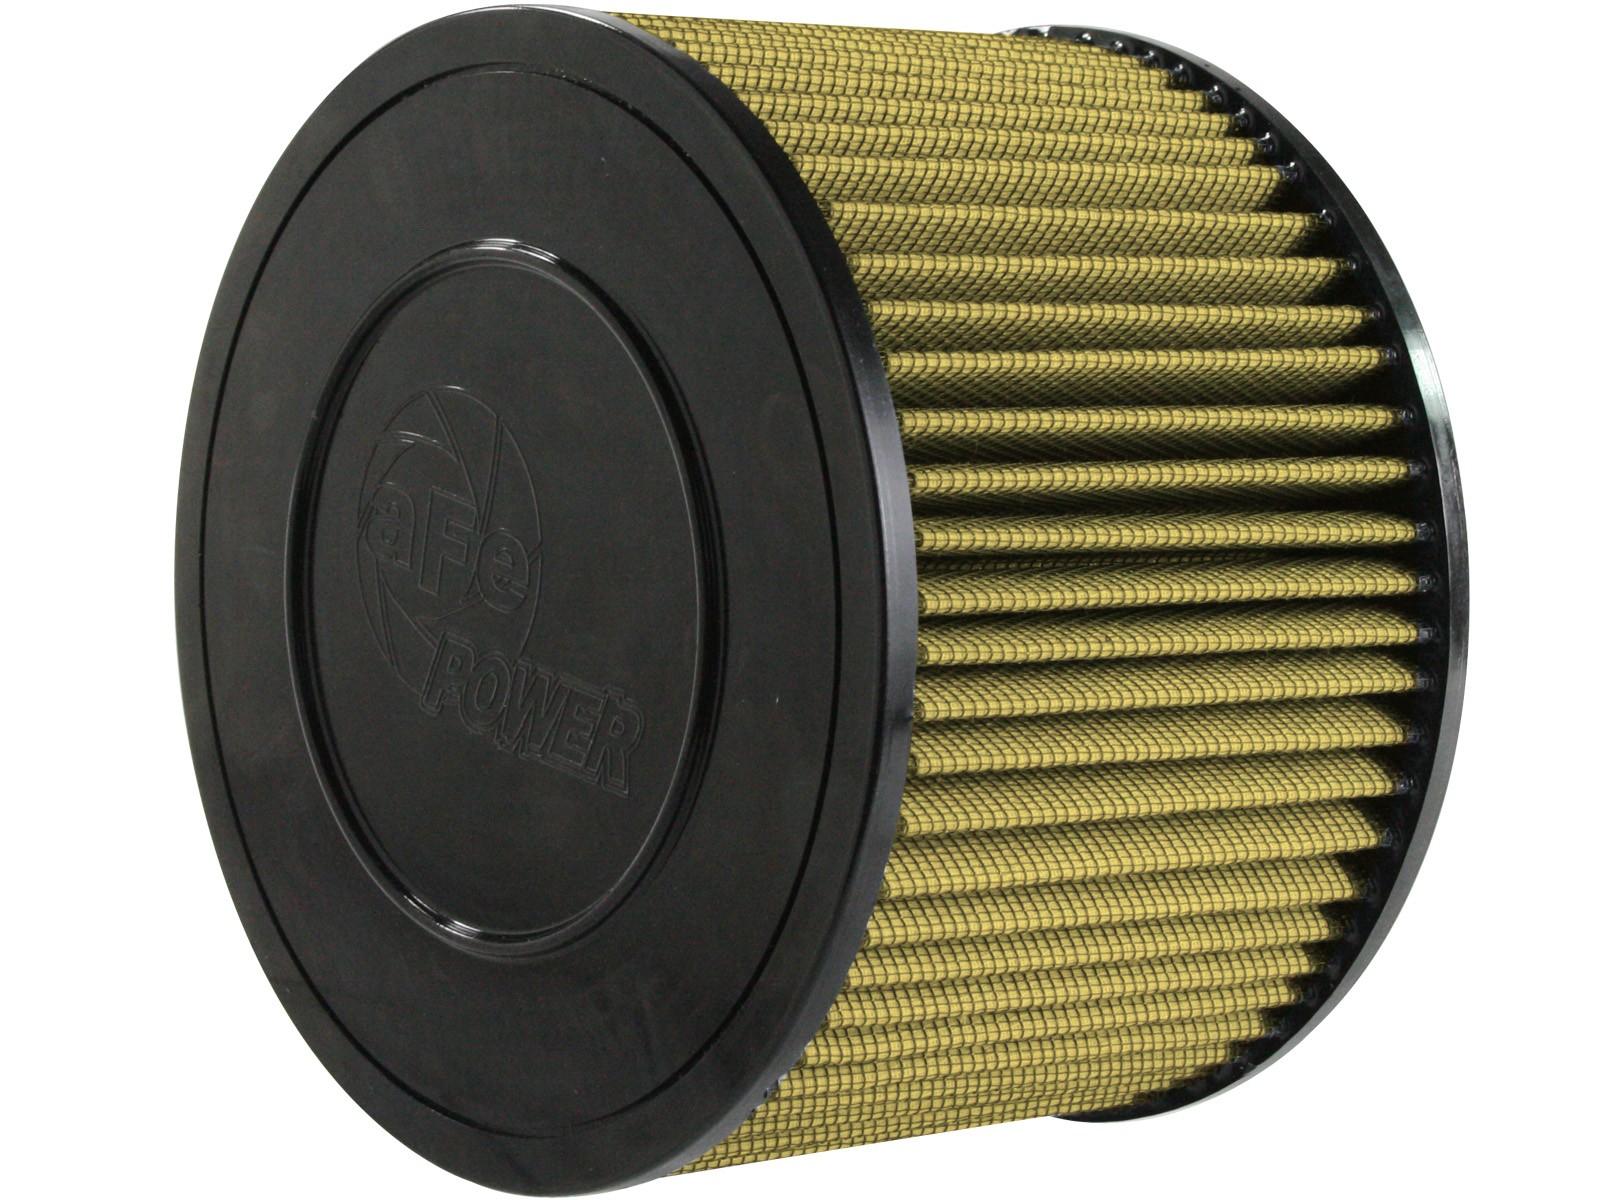 aFe POWER 71-10120 Magnum FLOW Pro GUARD7 Air Filter